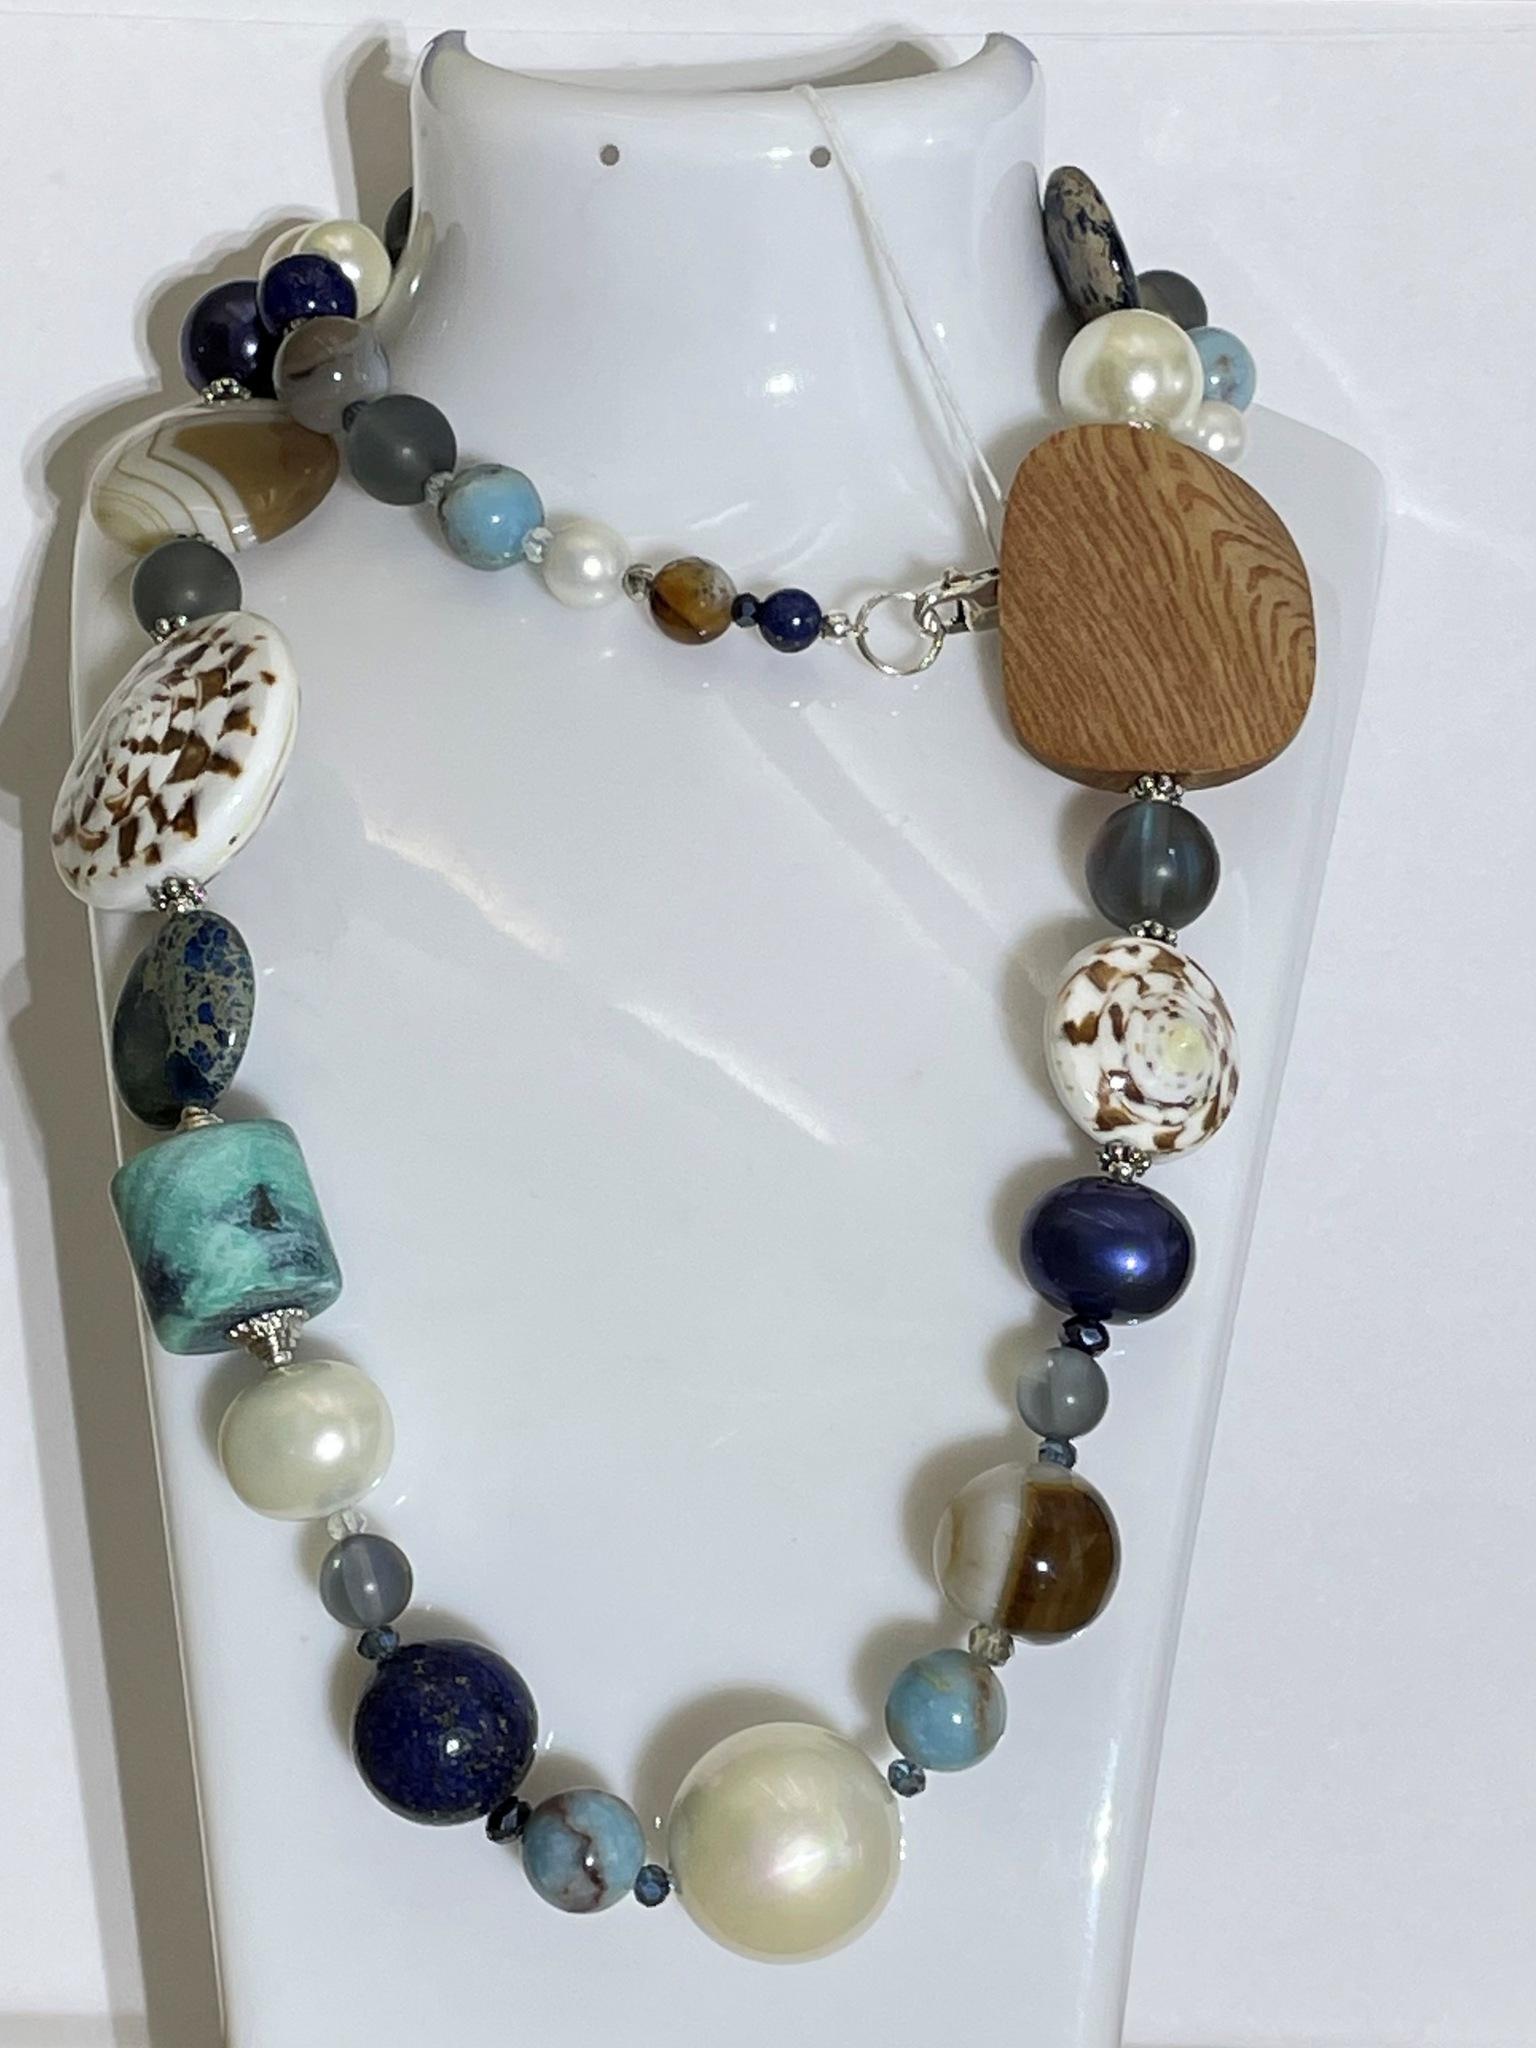 810-яшма (бусы из натуральных камней)